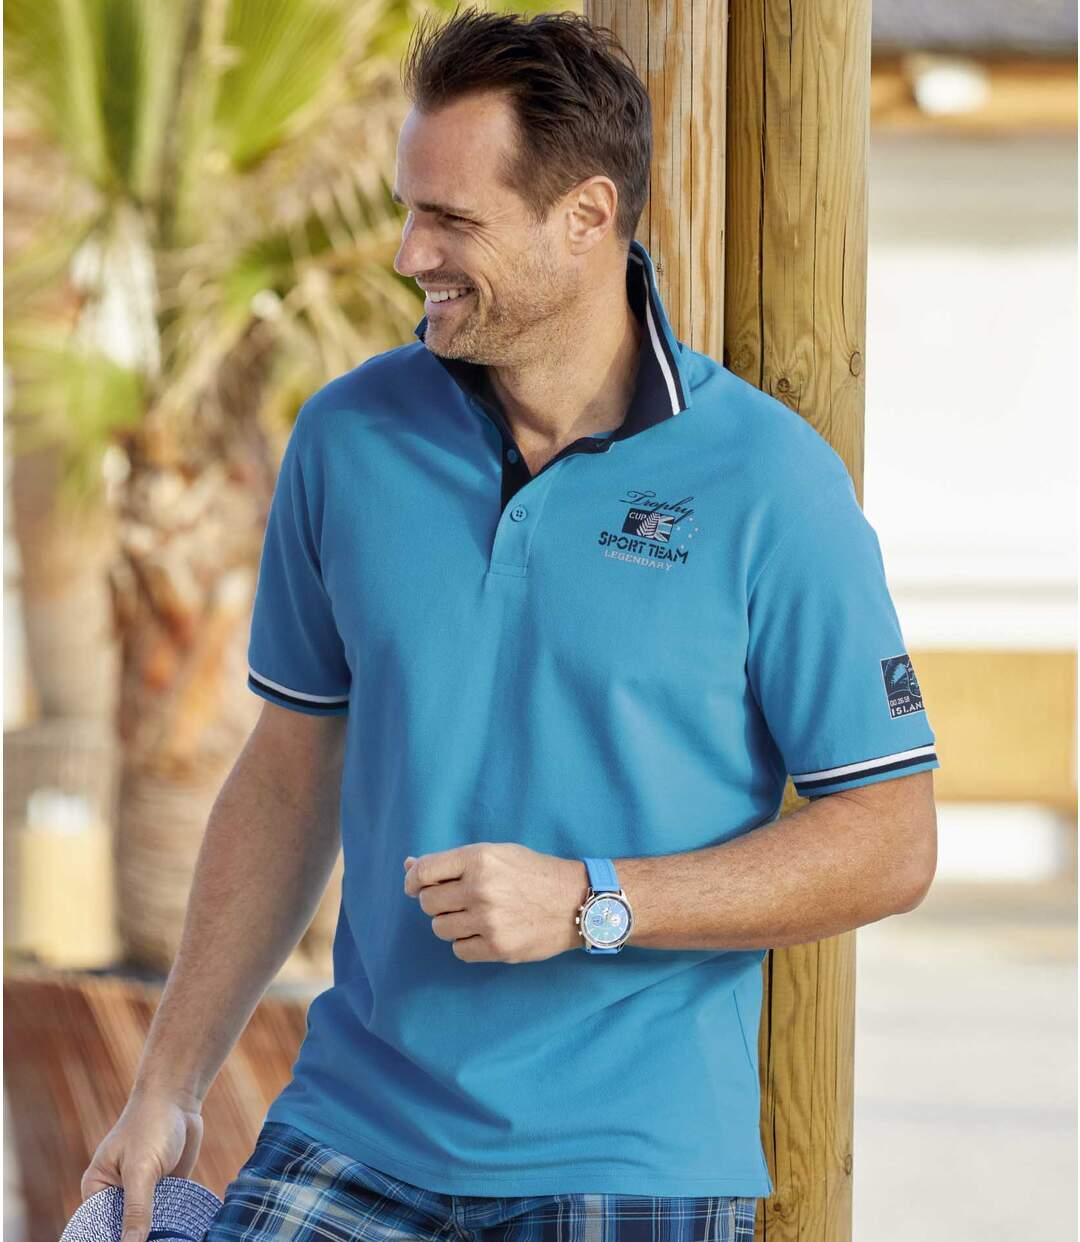 2er-Pack Poloshirts Island Cup in Piqué-Qualität